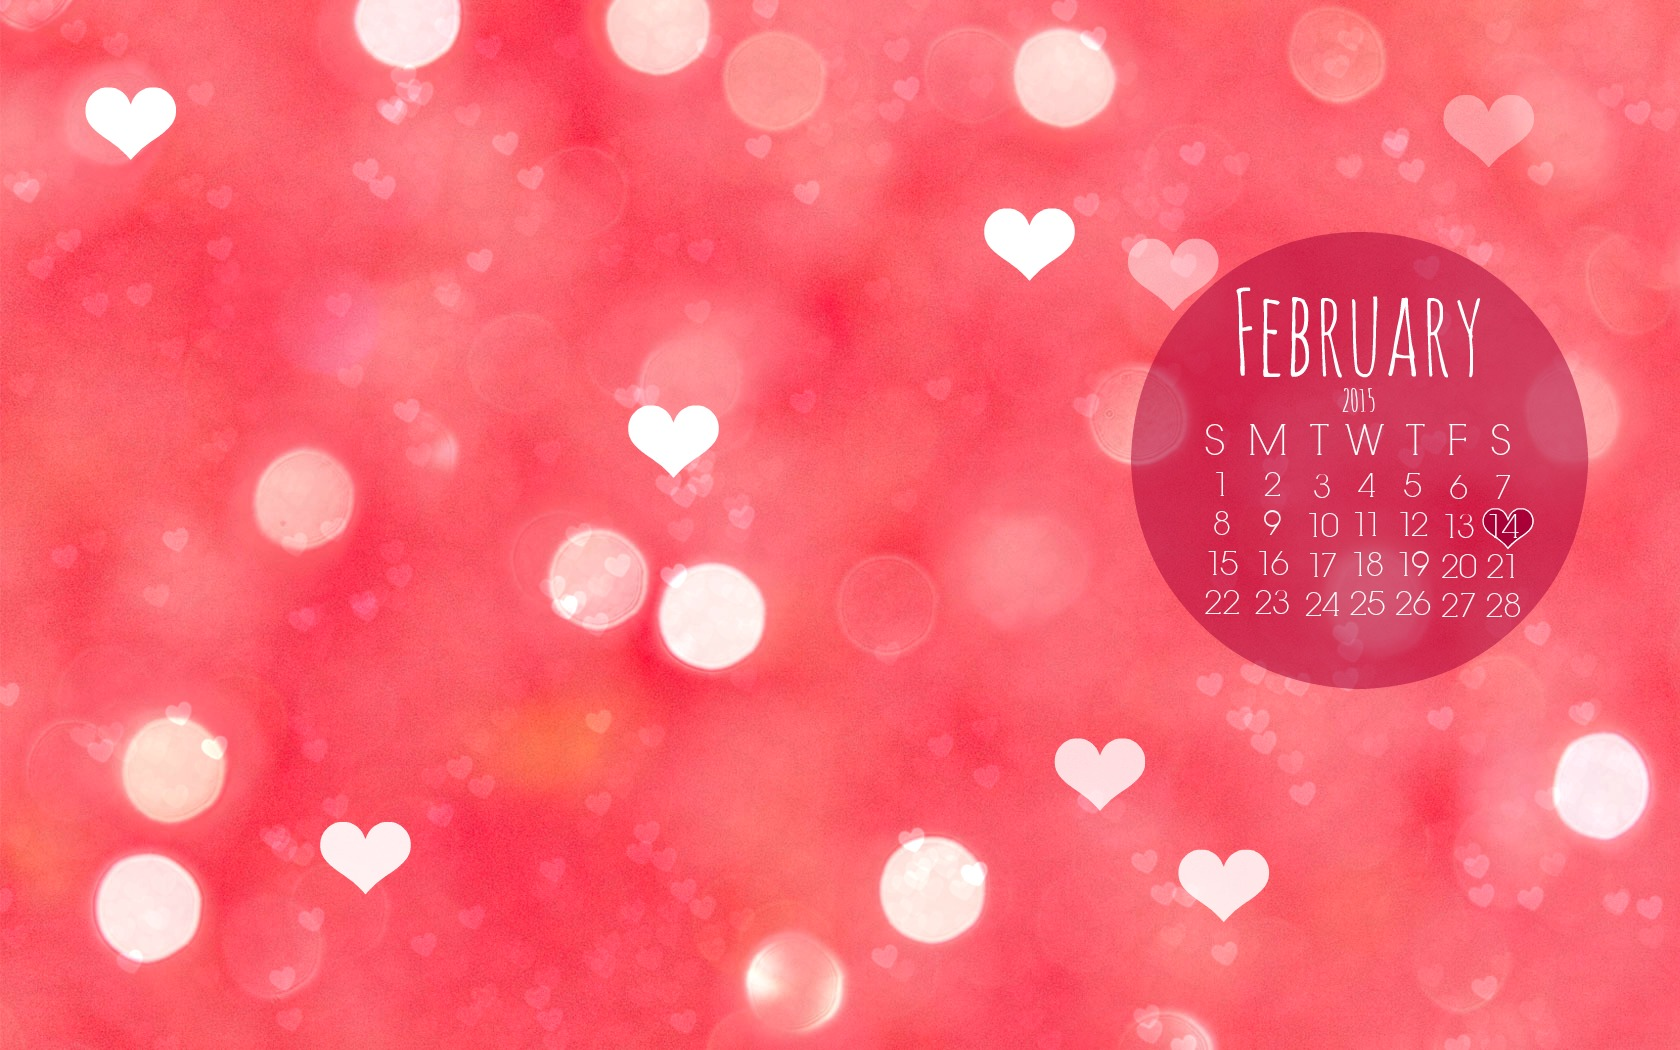 February Desktop Wallpaper 1680x1050